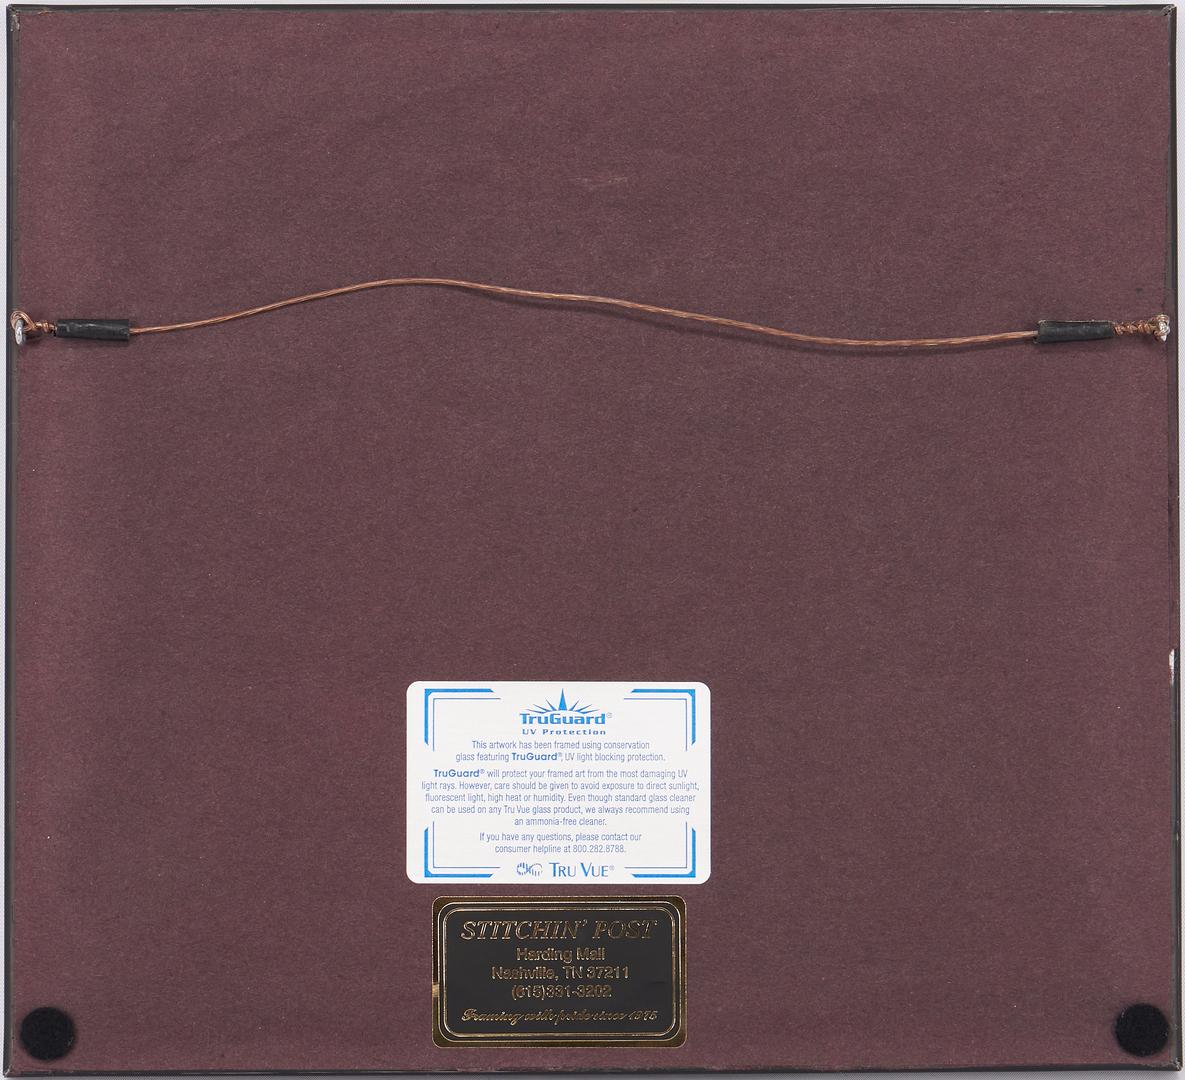 Lot 987: 2 Louis Jones, 1 Leon Pescheret Smoky Mtn. Etchings, 3 items